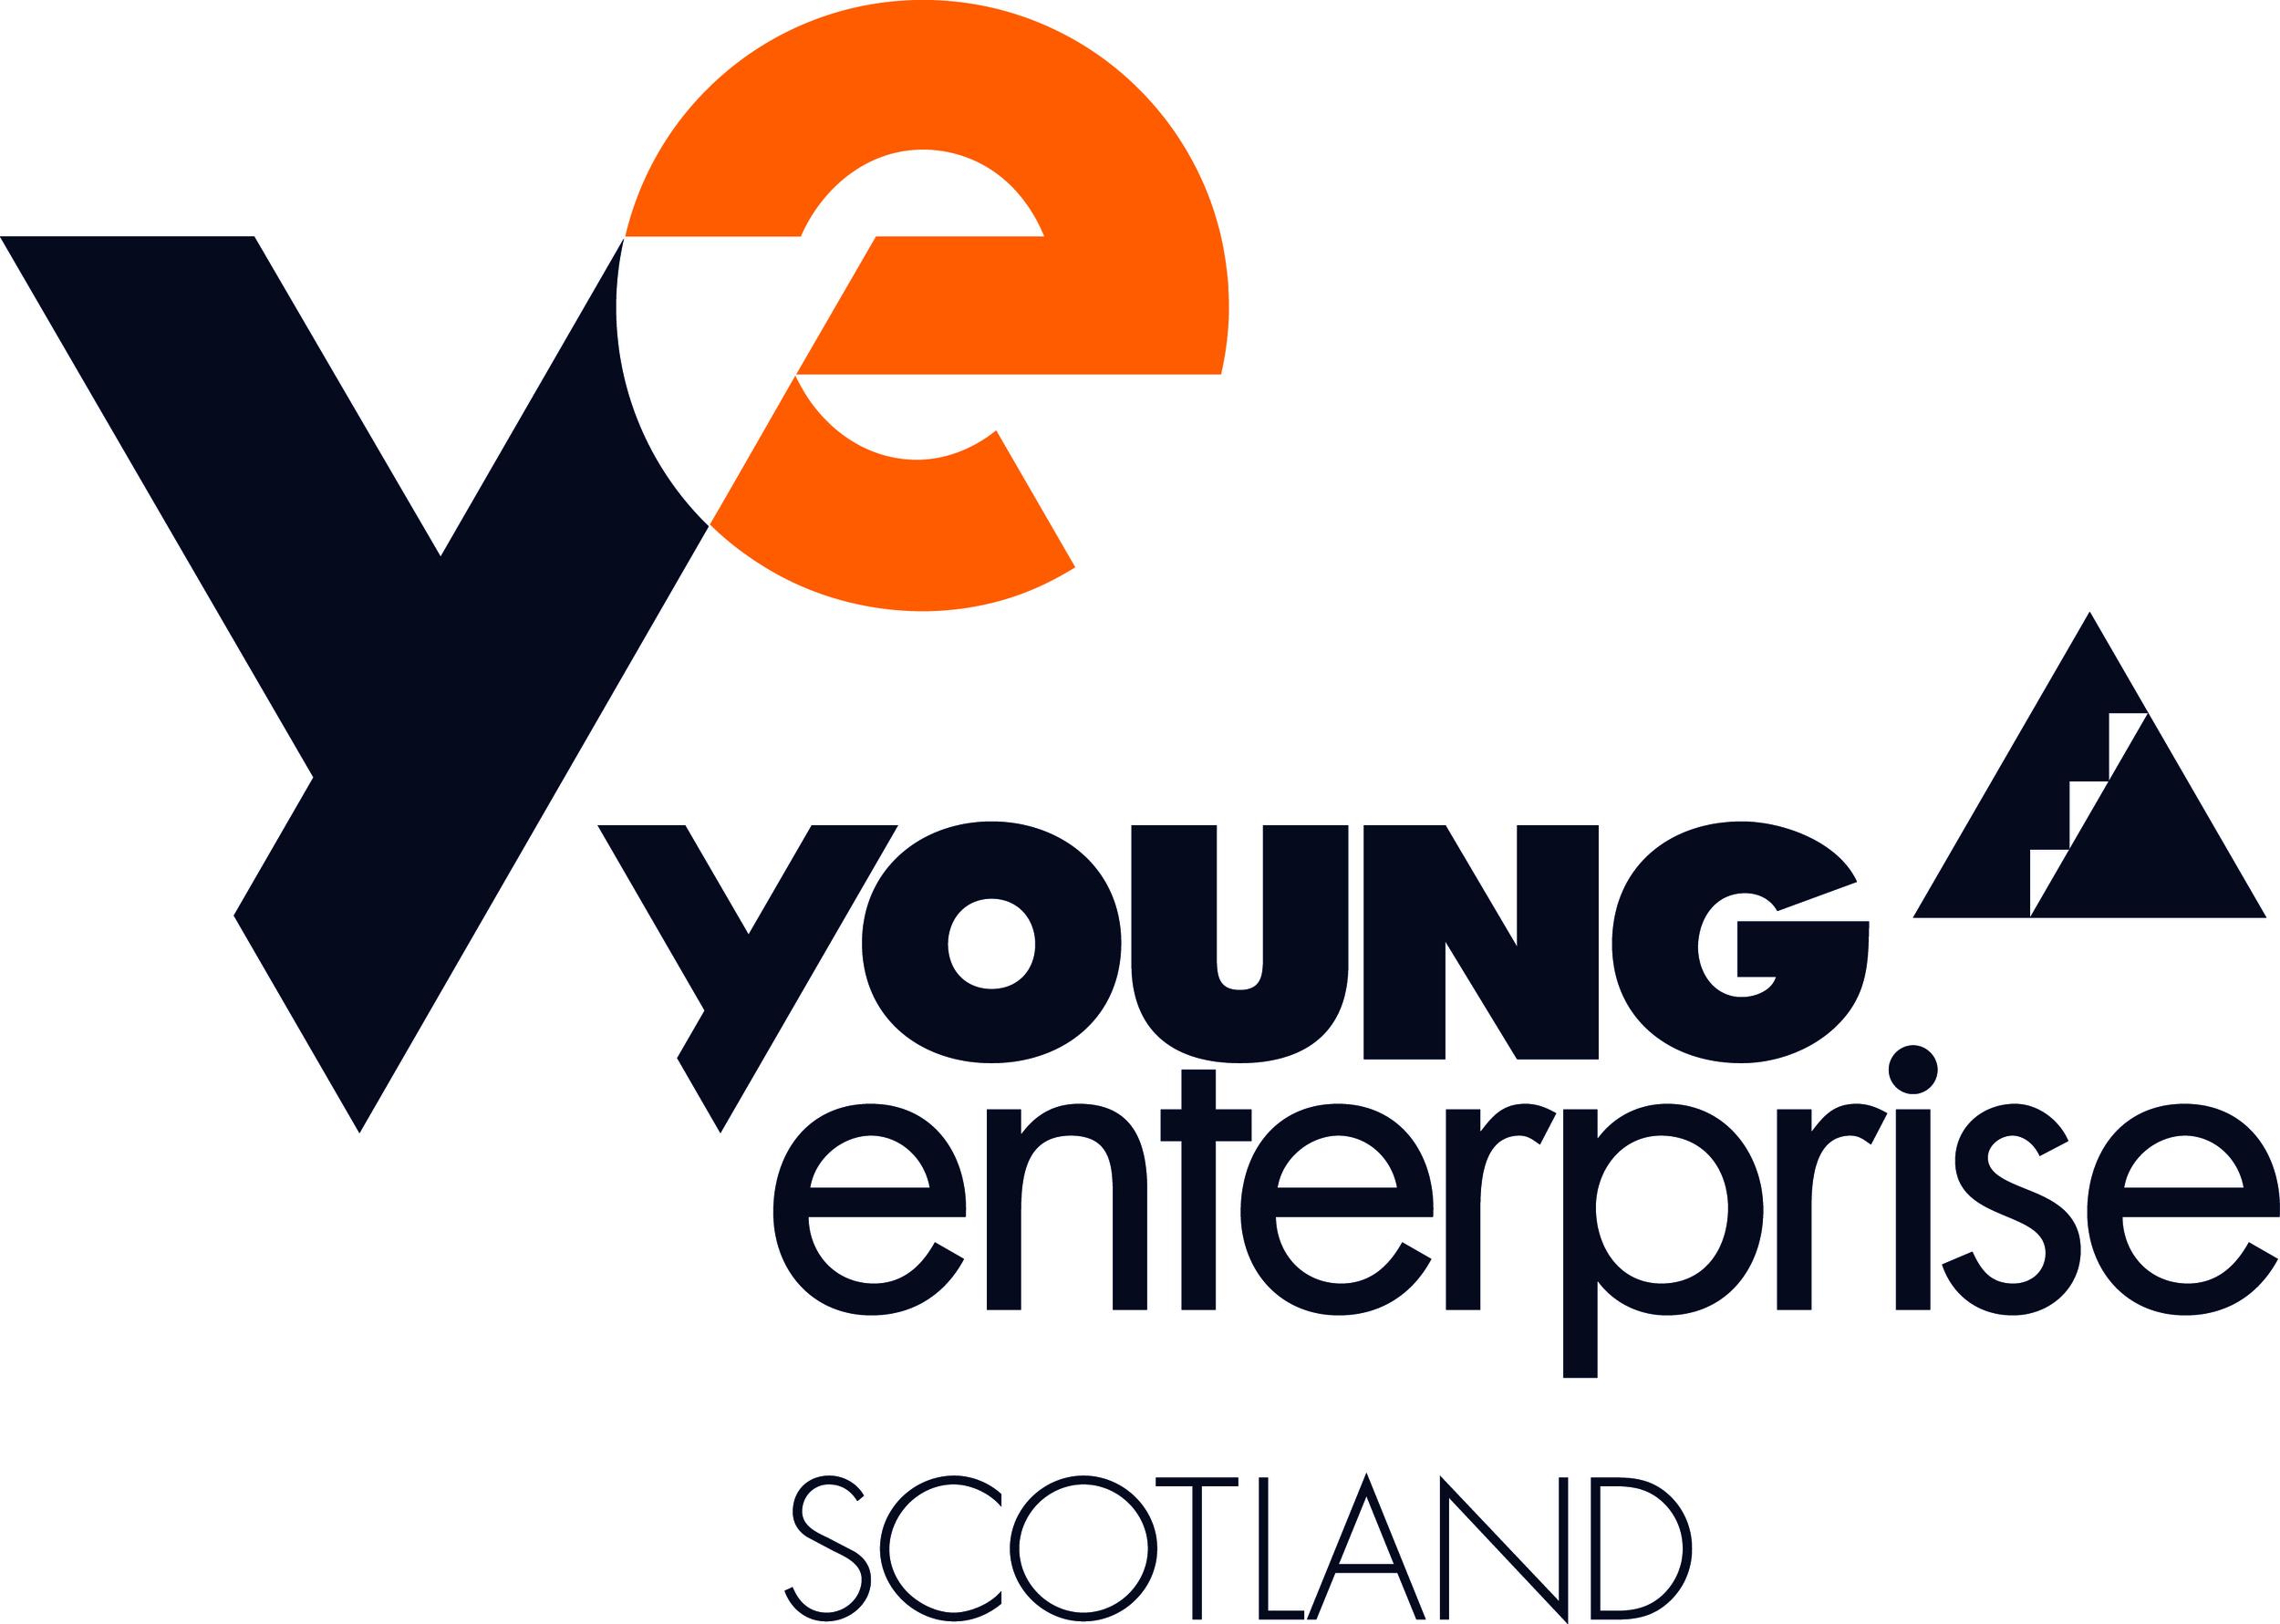 YE_ScotlandLogo_BigText_CMYK-01.jpg